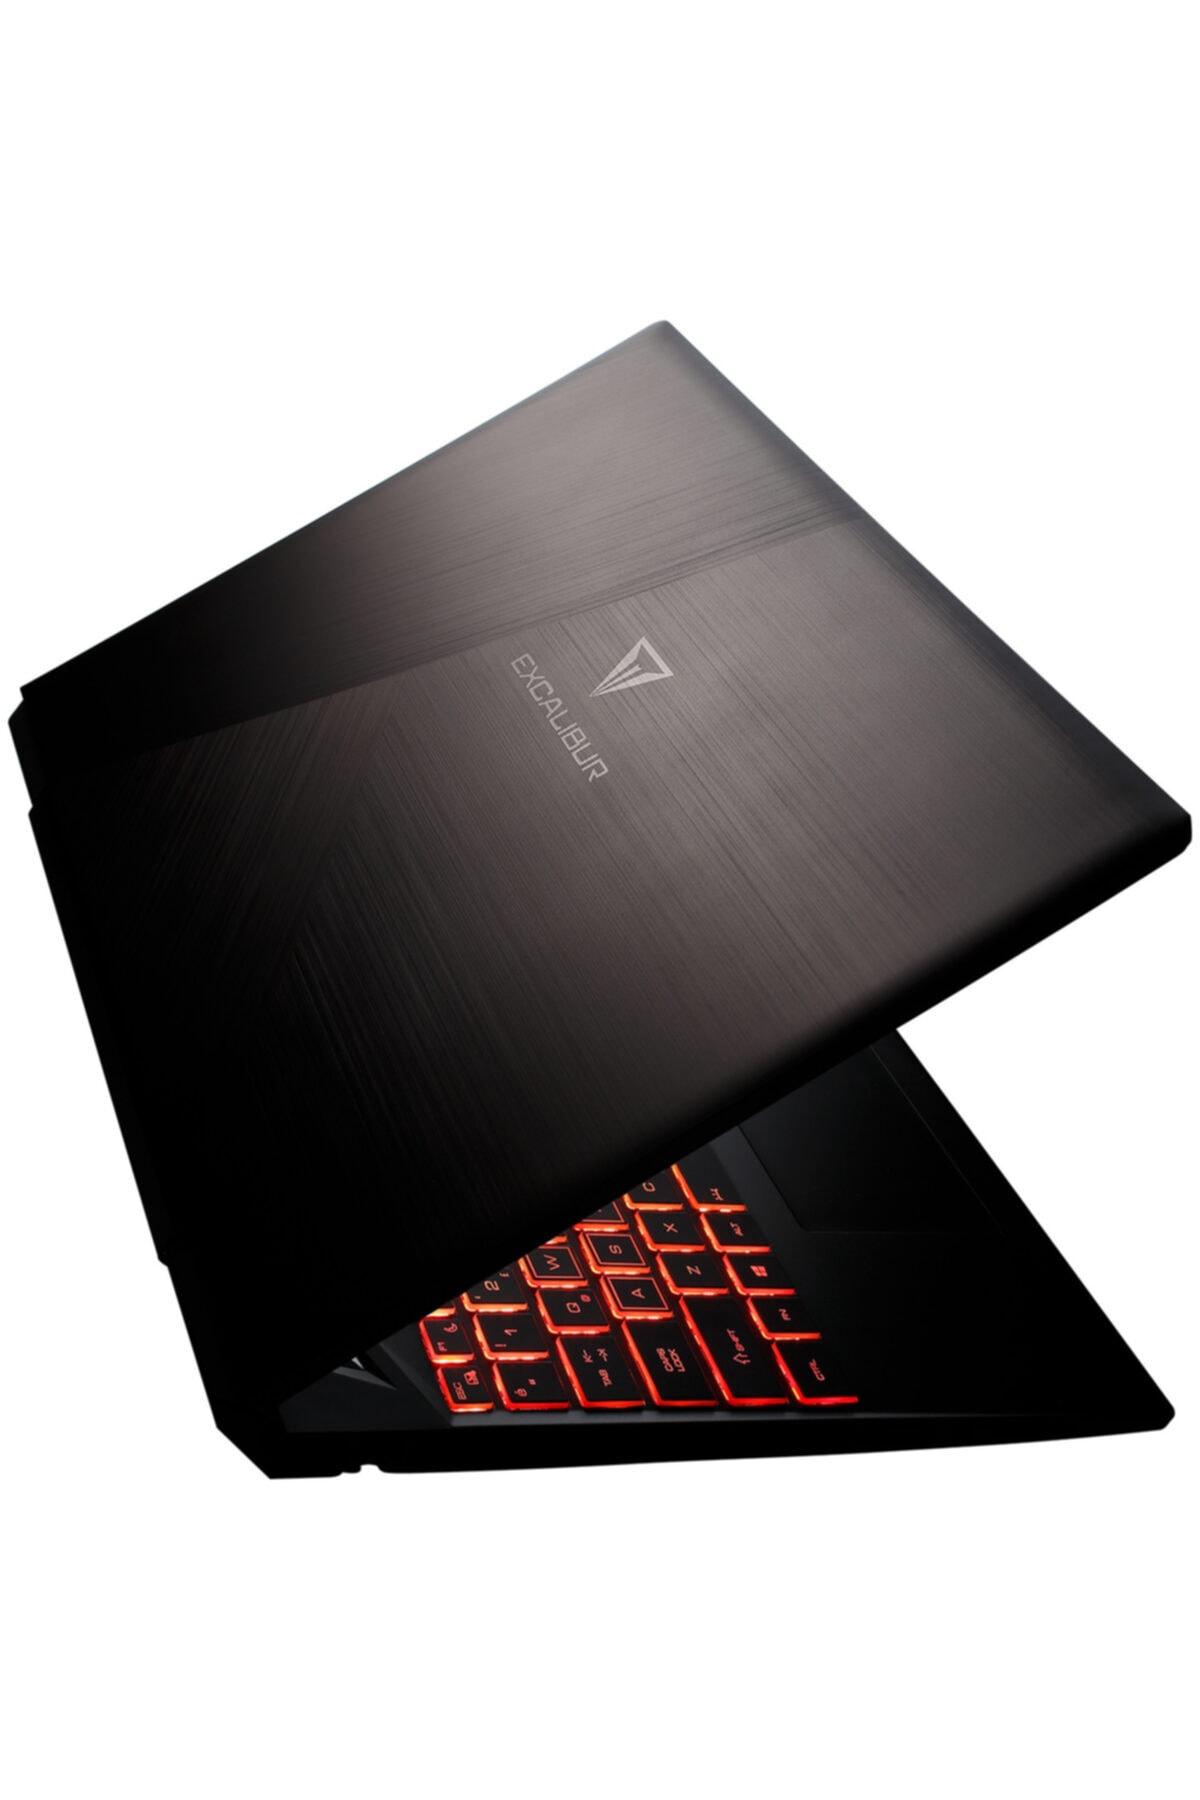 Casper Excalibur G770.9300-b1h0x 15.6'' Intel Core I5-9300h 16gb Ram 1tb+120 Ssd 4gb Gtx 1650 Freedos